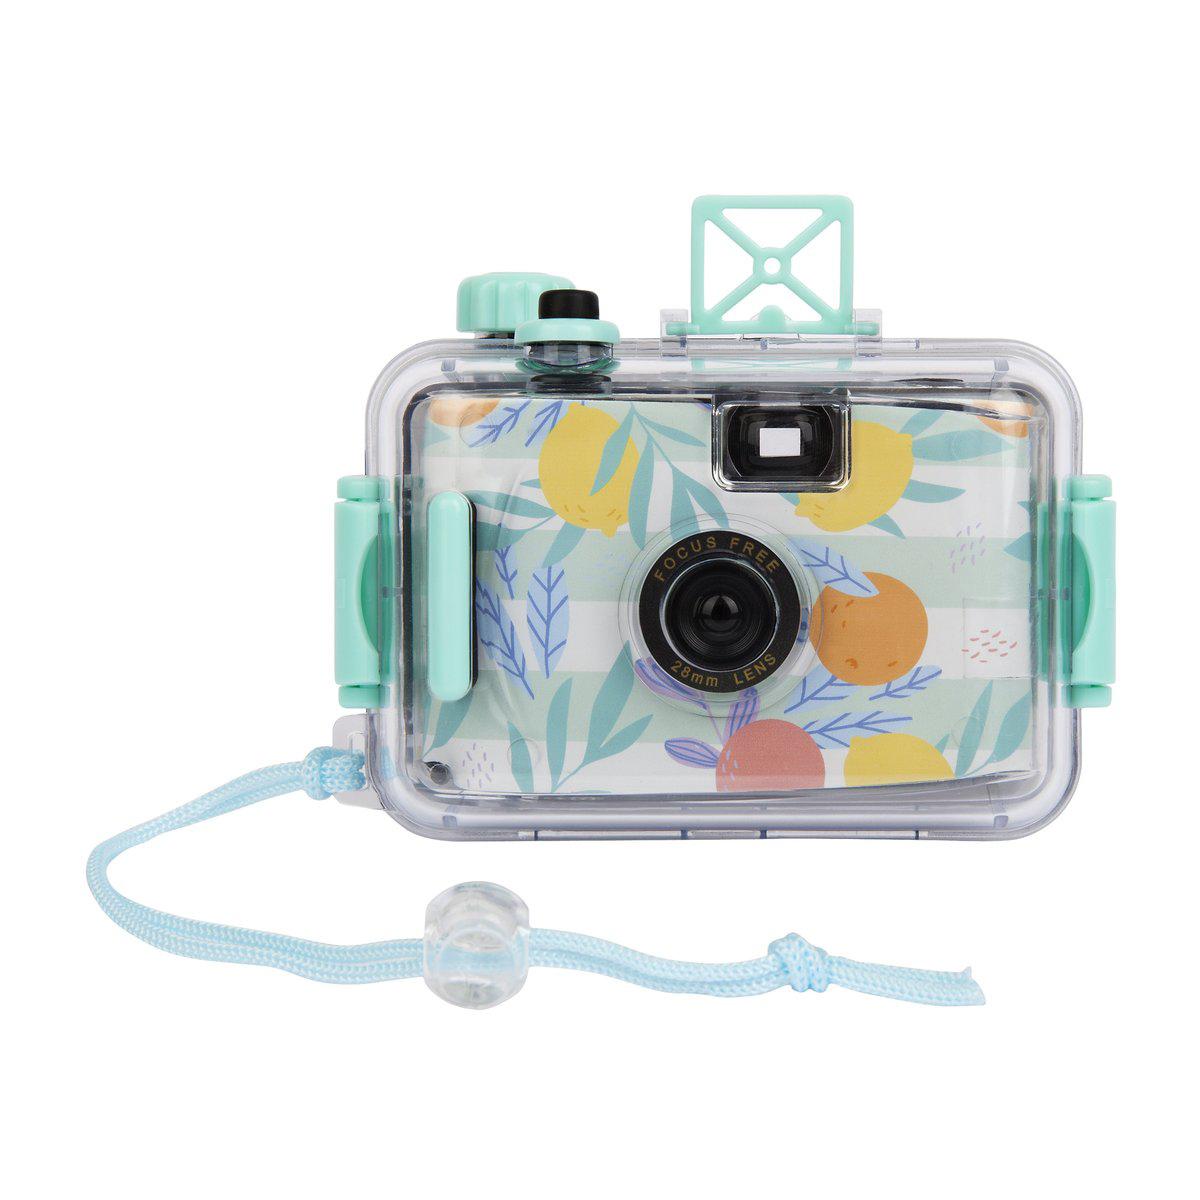 318212 malibu underwater camera unbranded